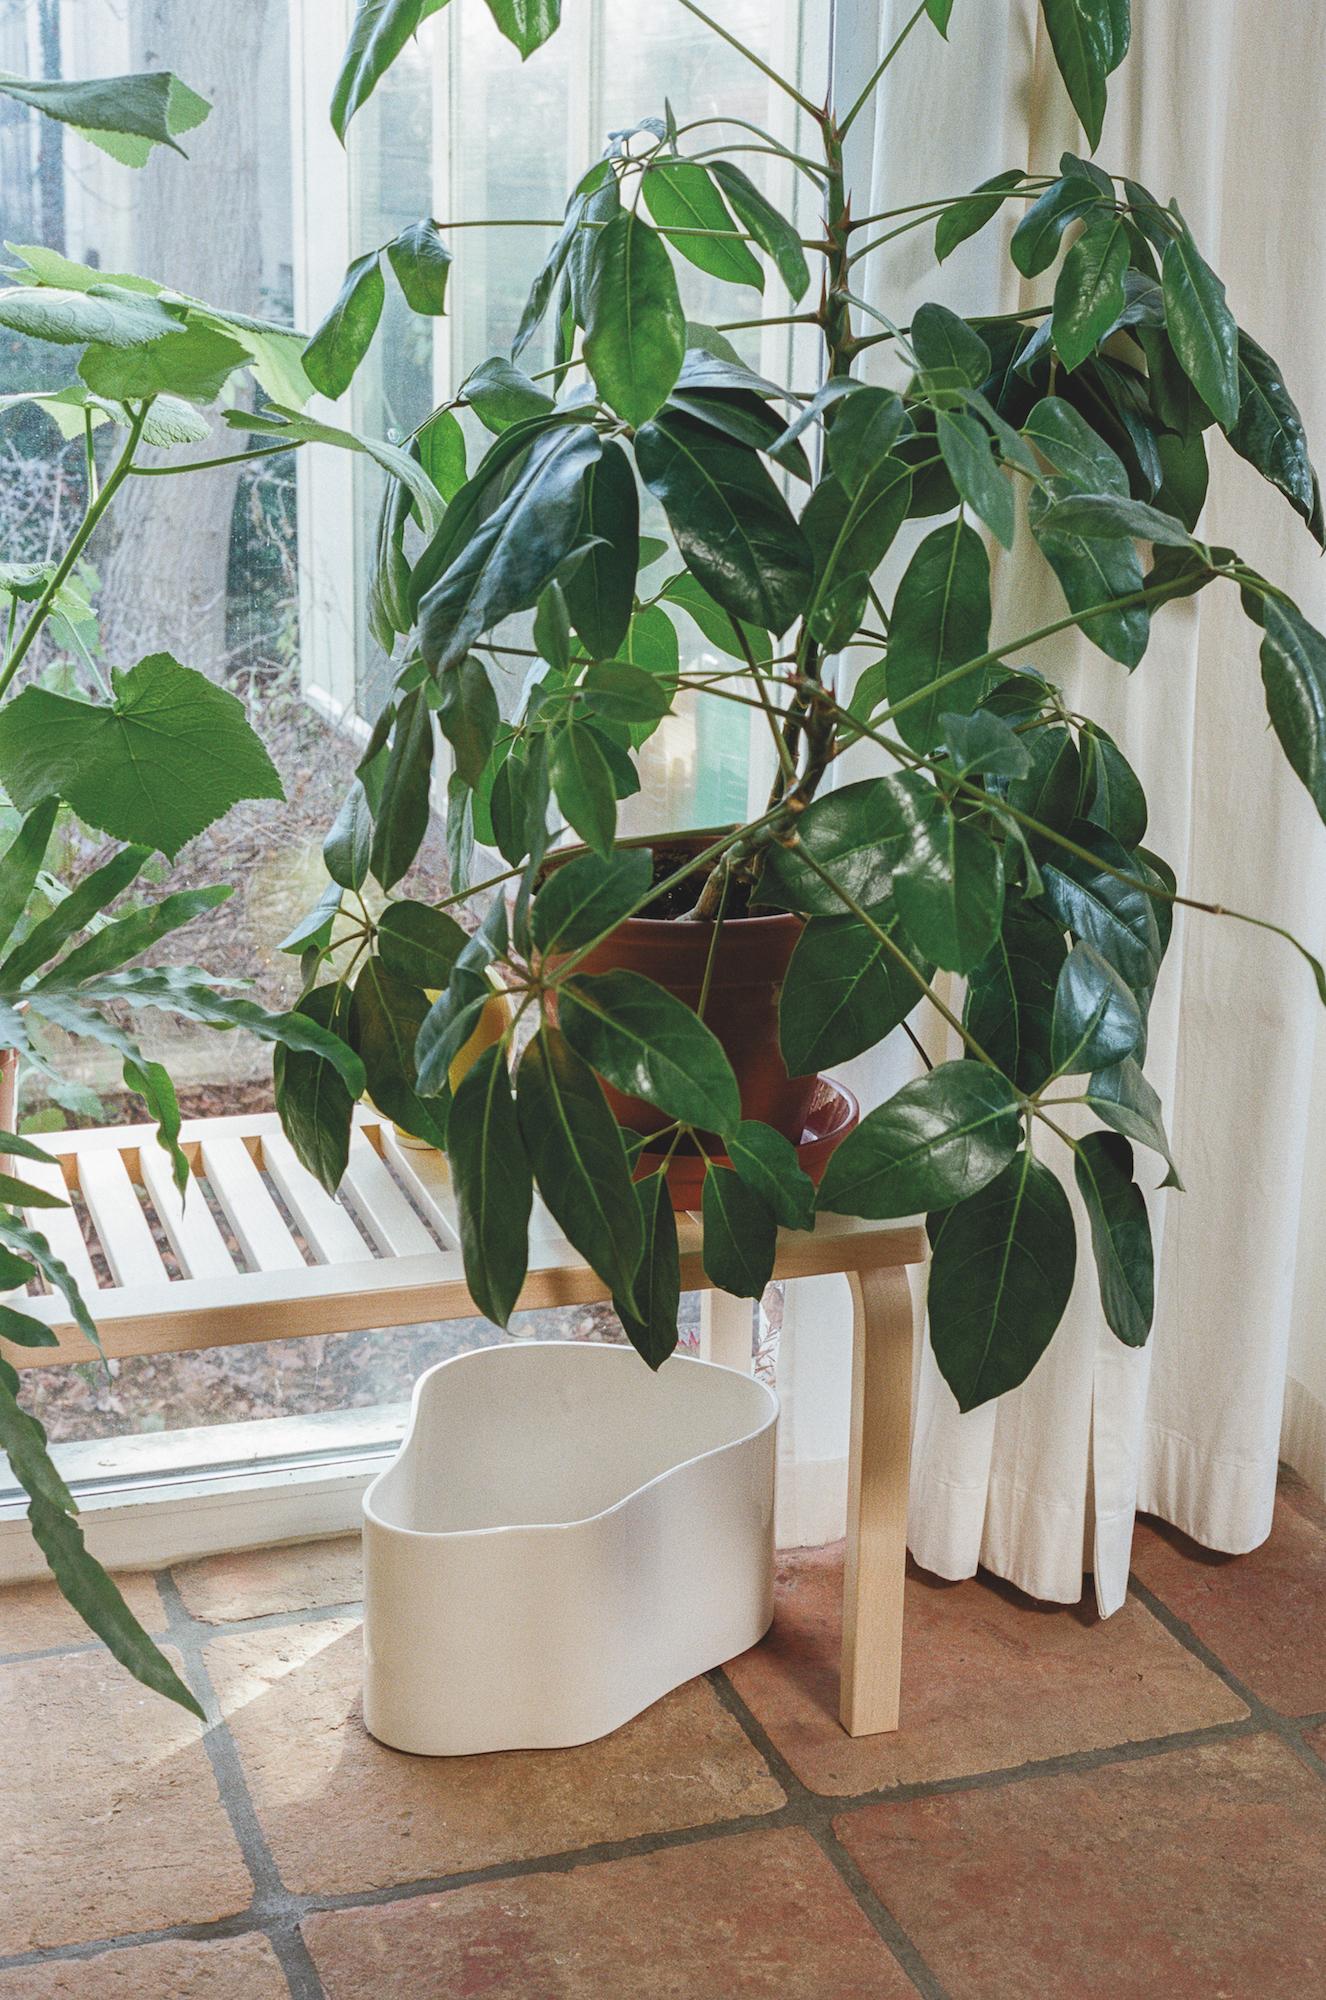 Artek Riihitie Plant Pots Design Aino Aalto